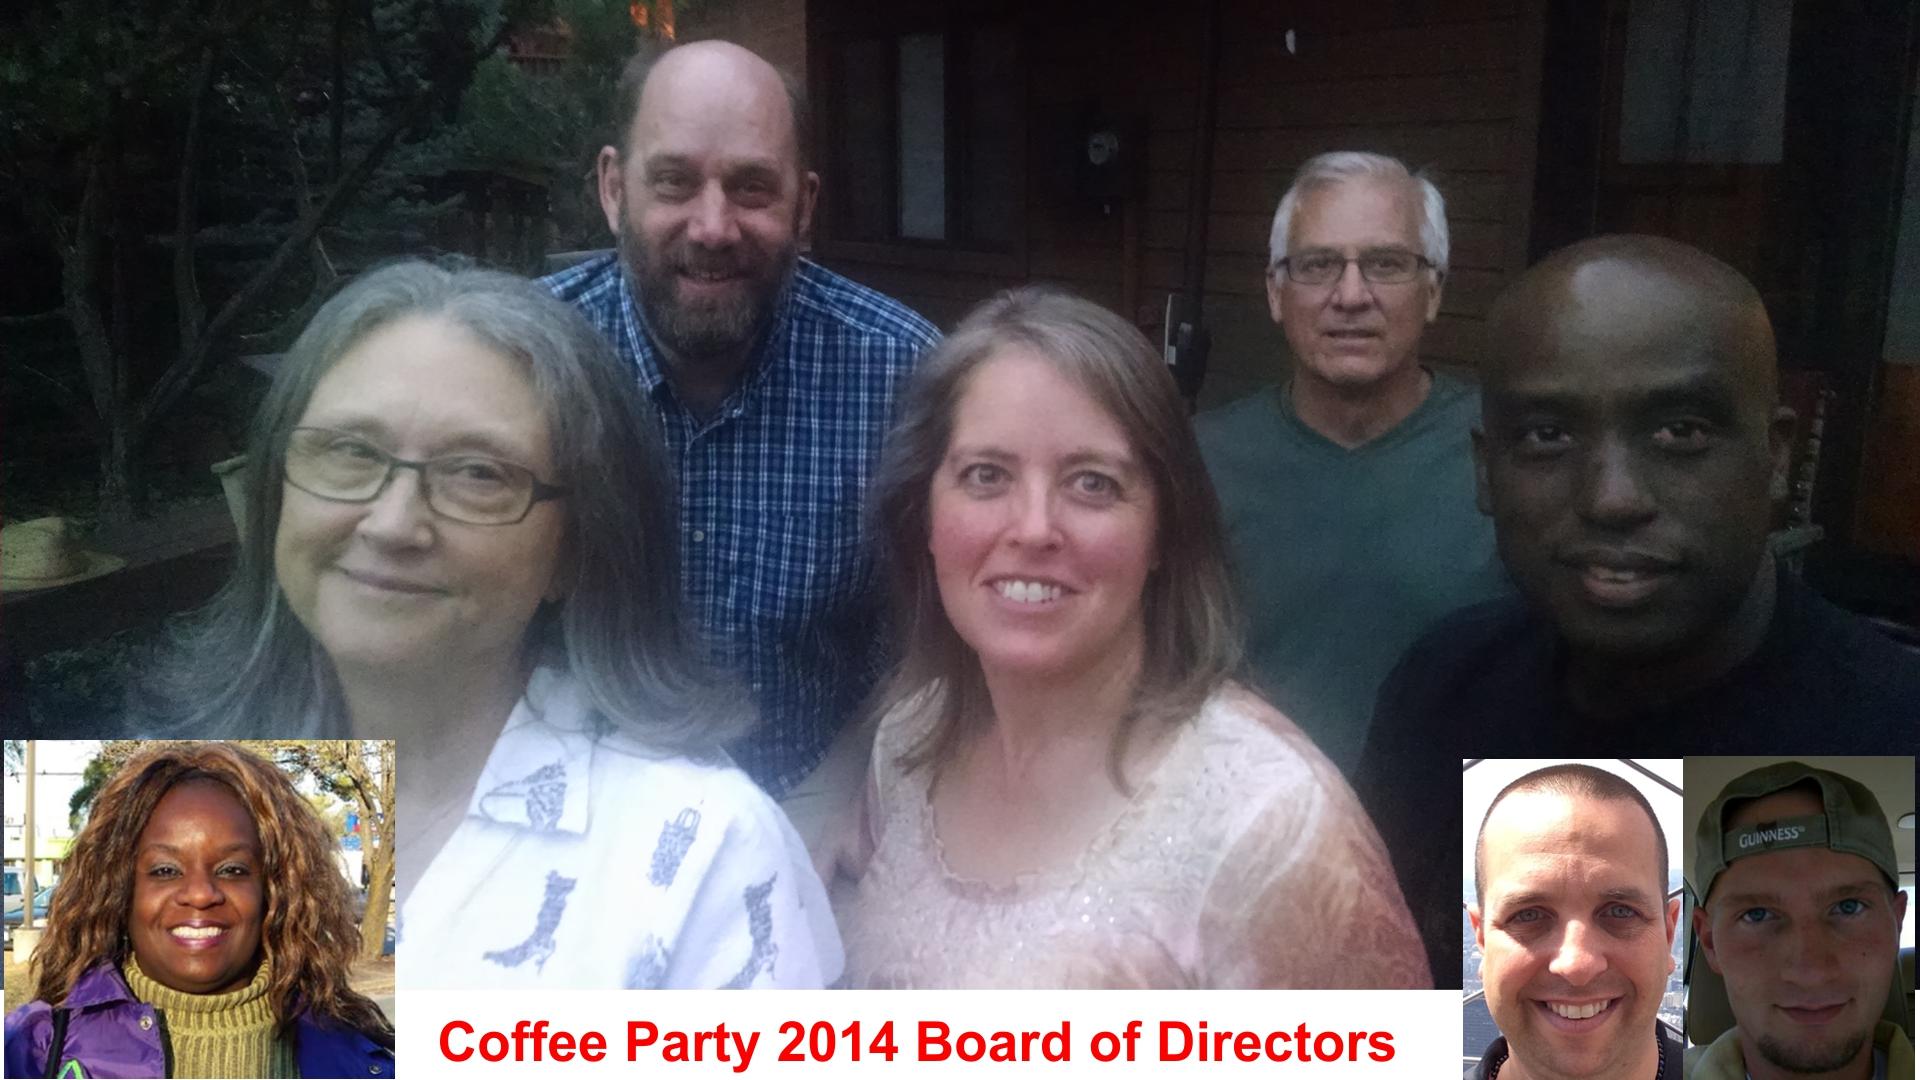 Coffee Party Board of Directors